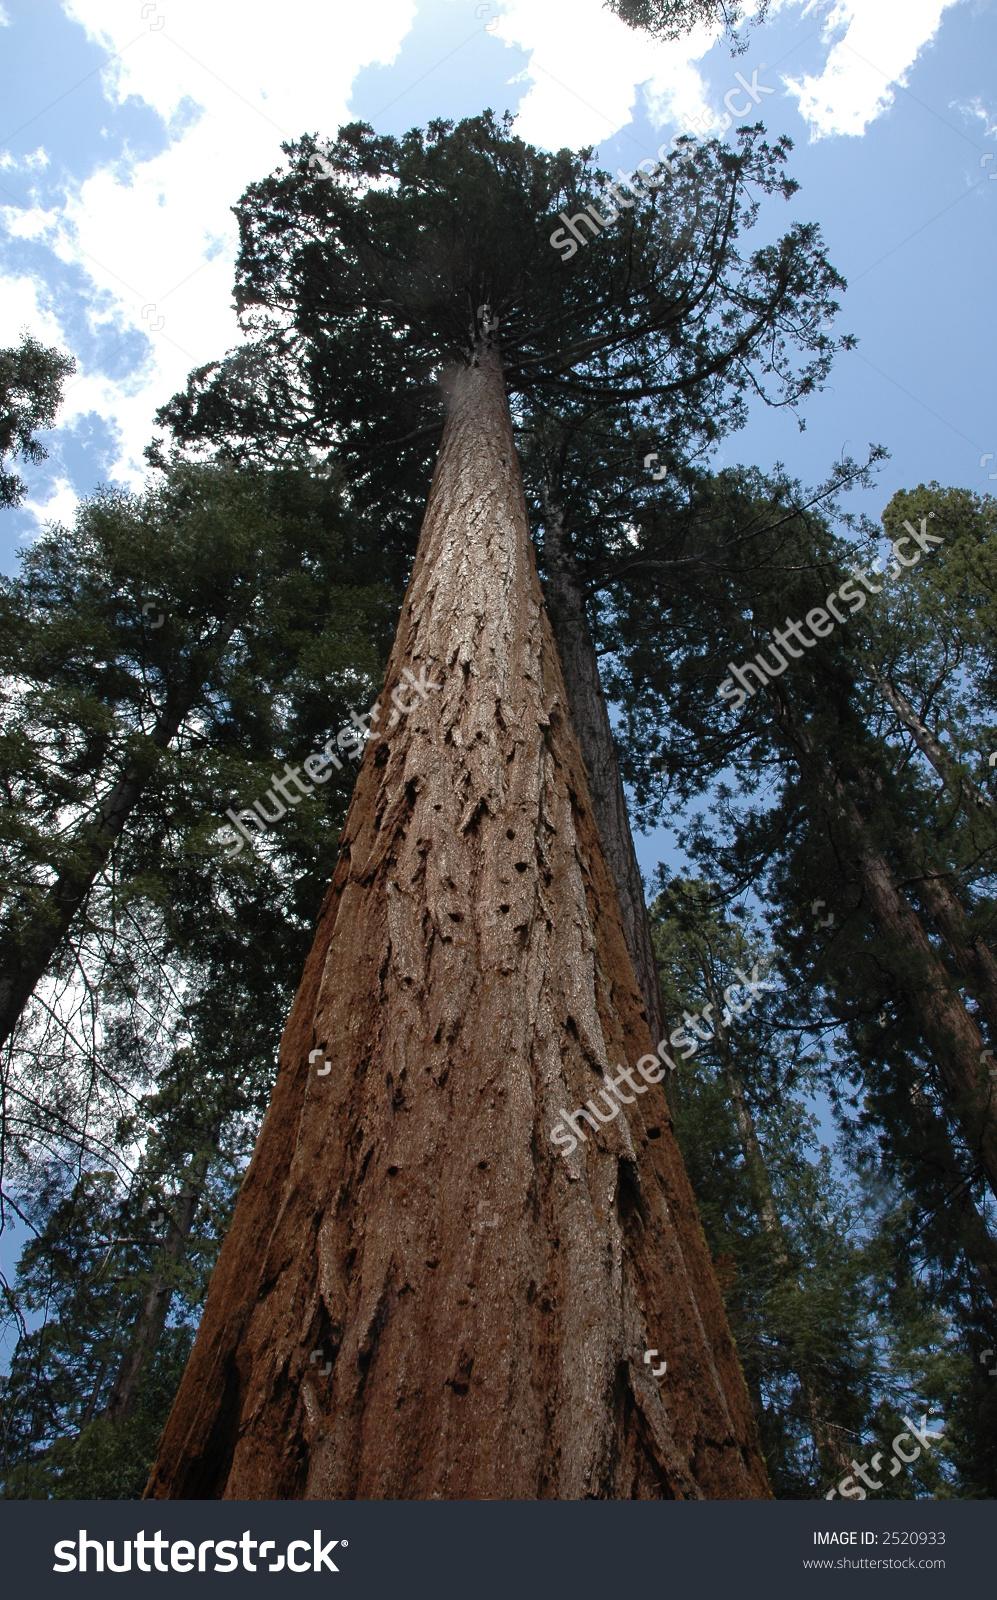 Giant Sequoia Tree Stock Photo 2520933 : Shutterstock.